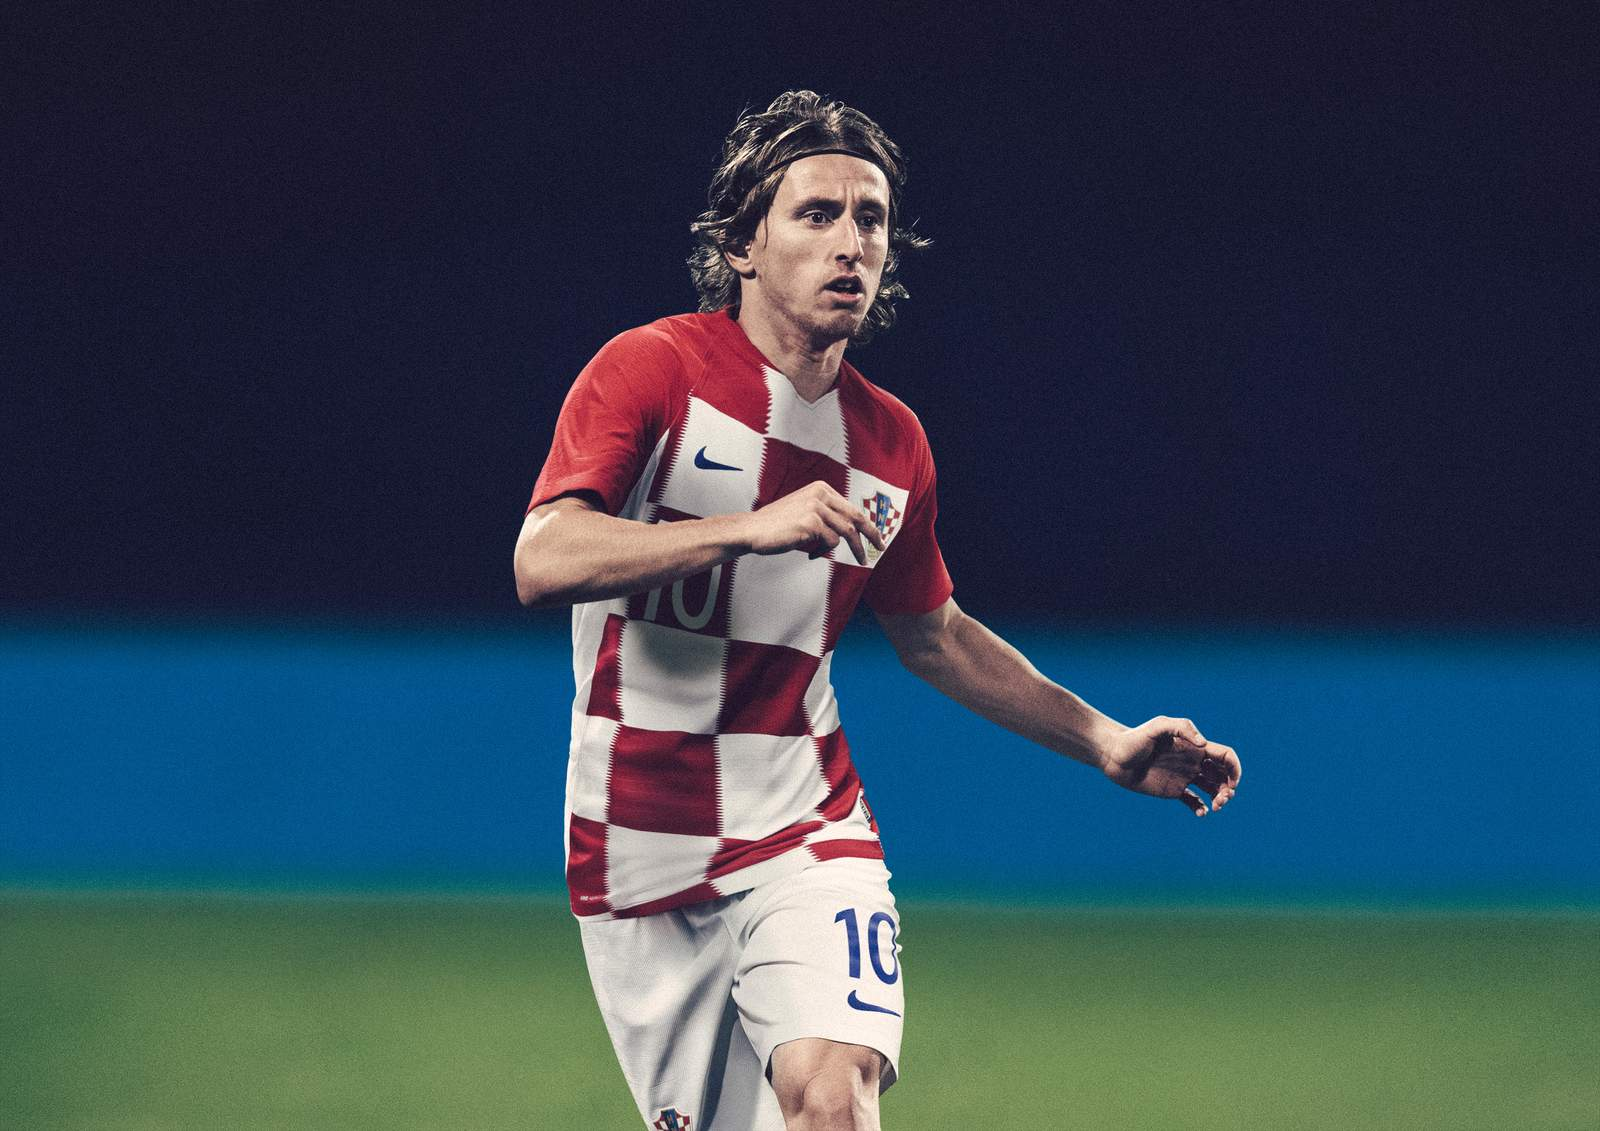 Croatie 2018 maillot domicile Modric Coupe du monde 2018 Nike